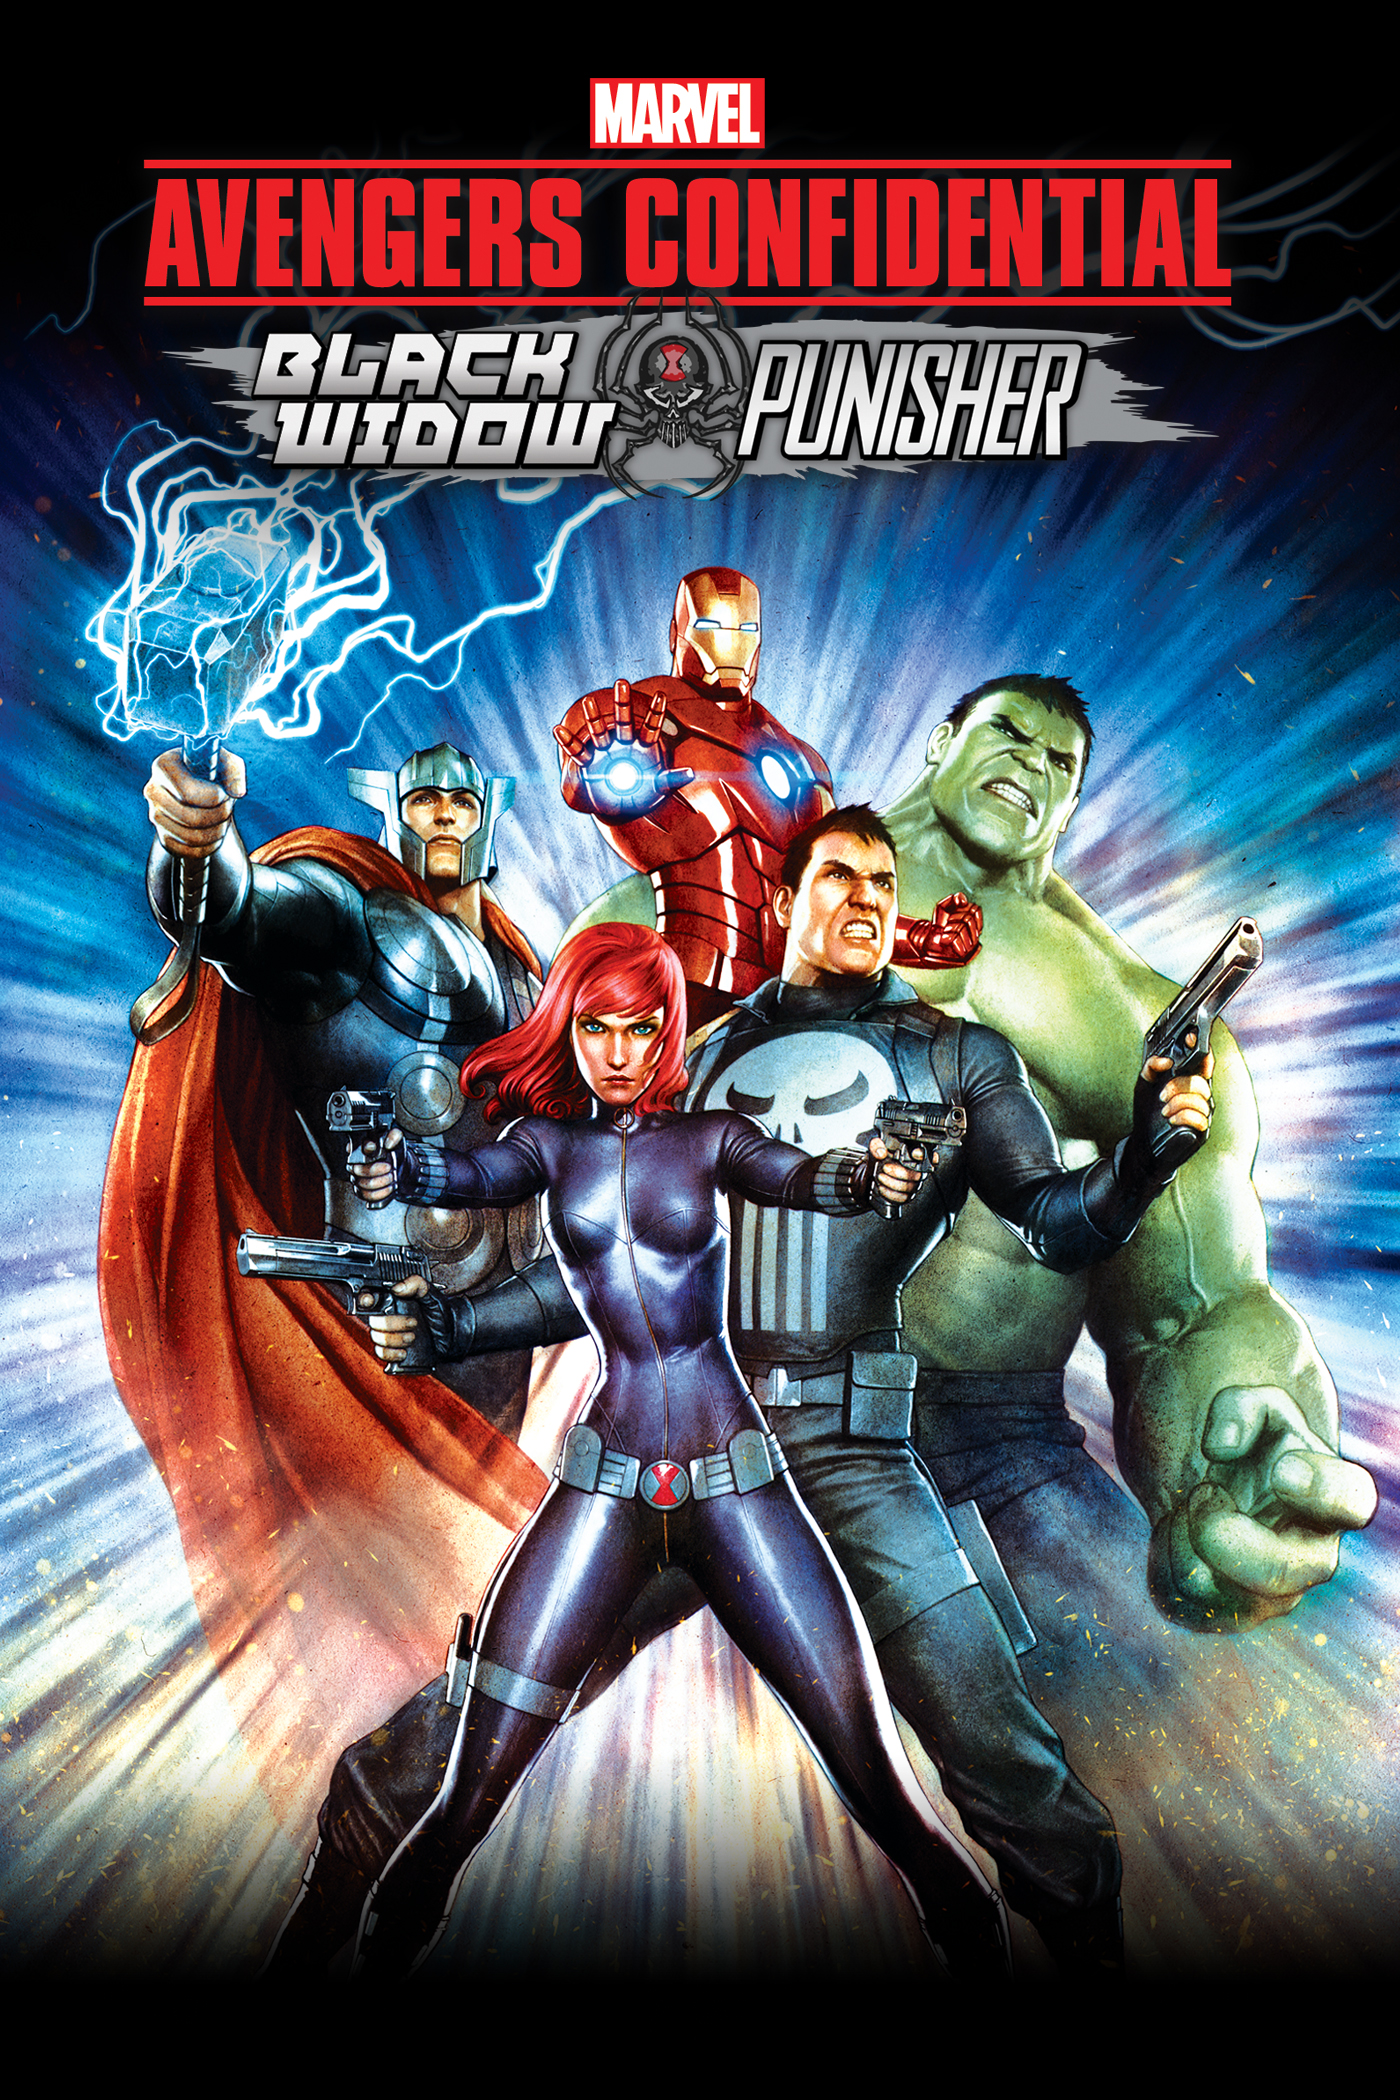 Avengers: Los archivos secretos - Black Widow y Punisher | Doblaje ...